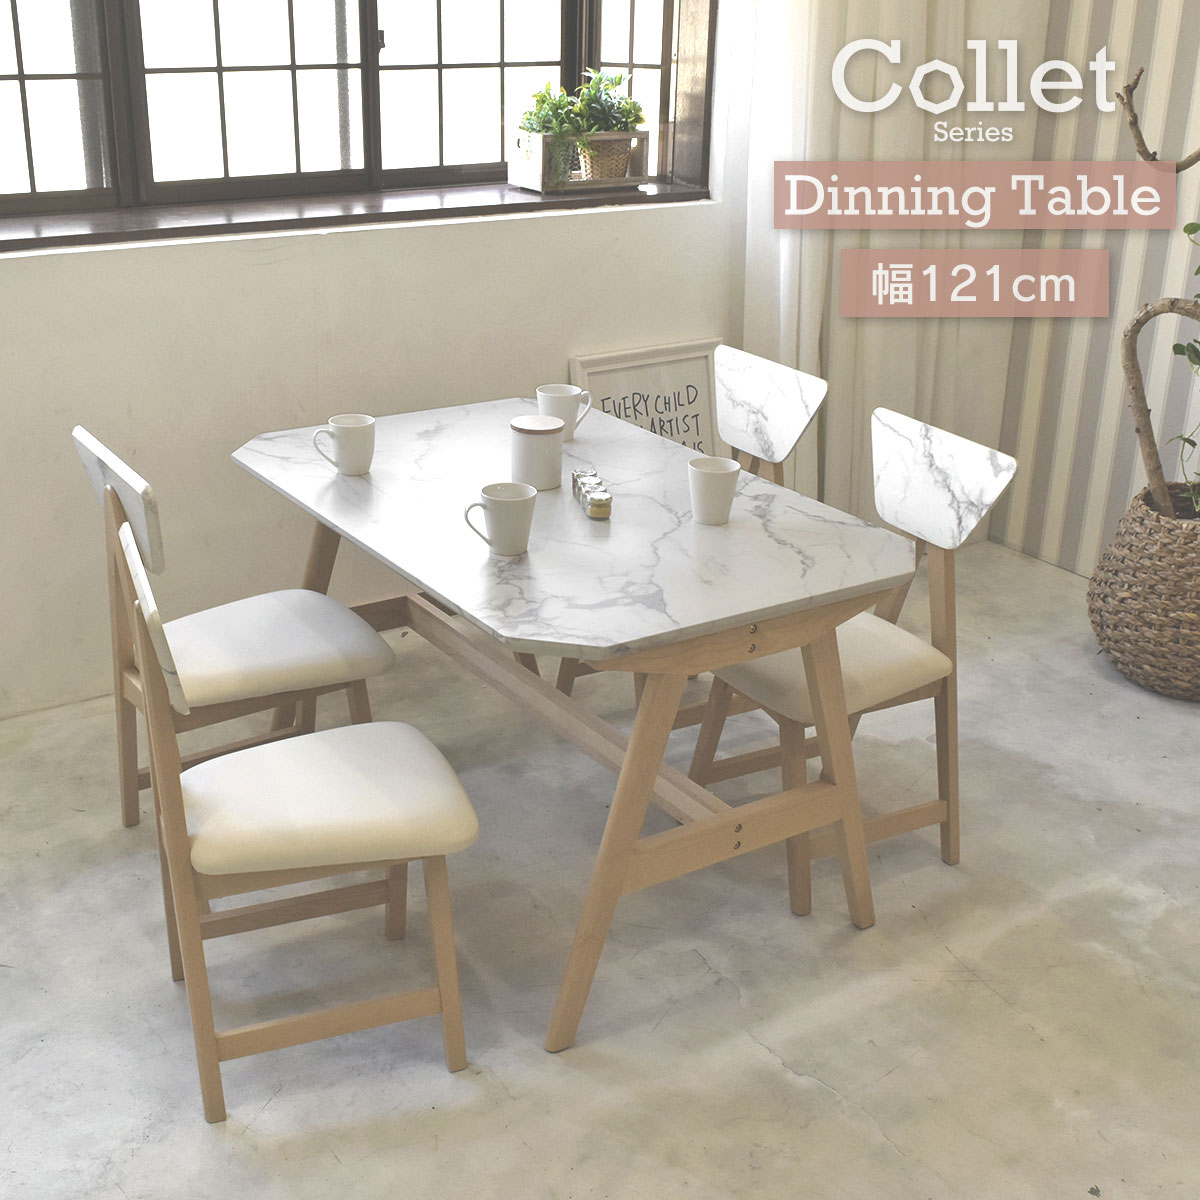 Collet コレクト ダイニングテーブル 幅121cm